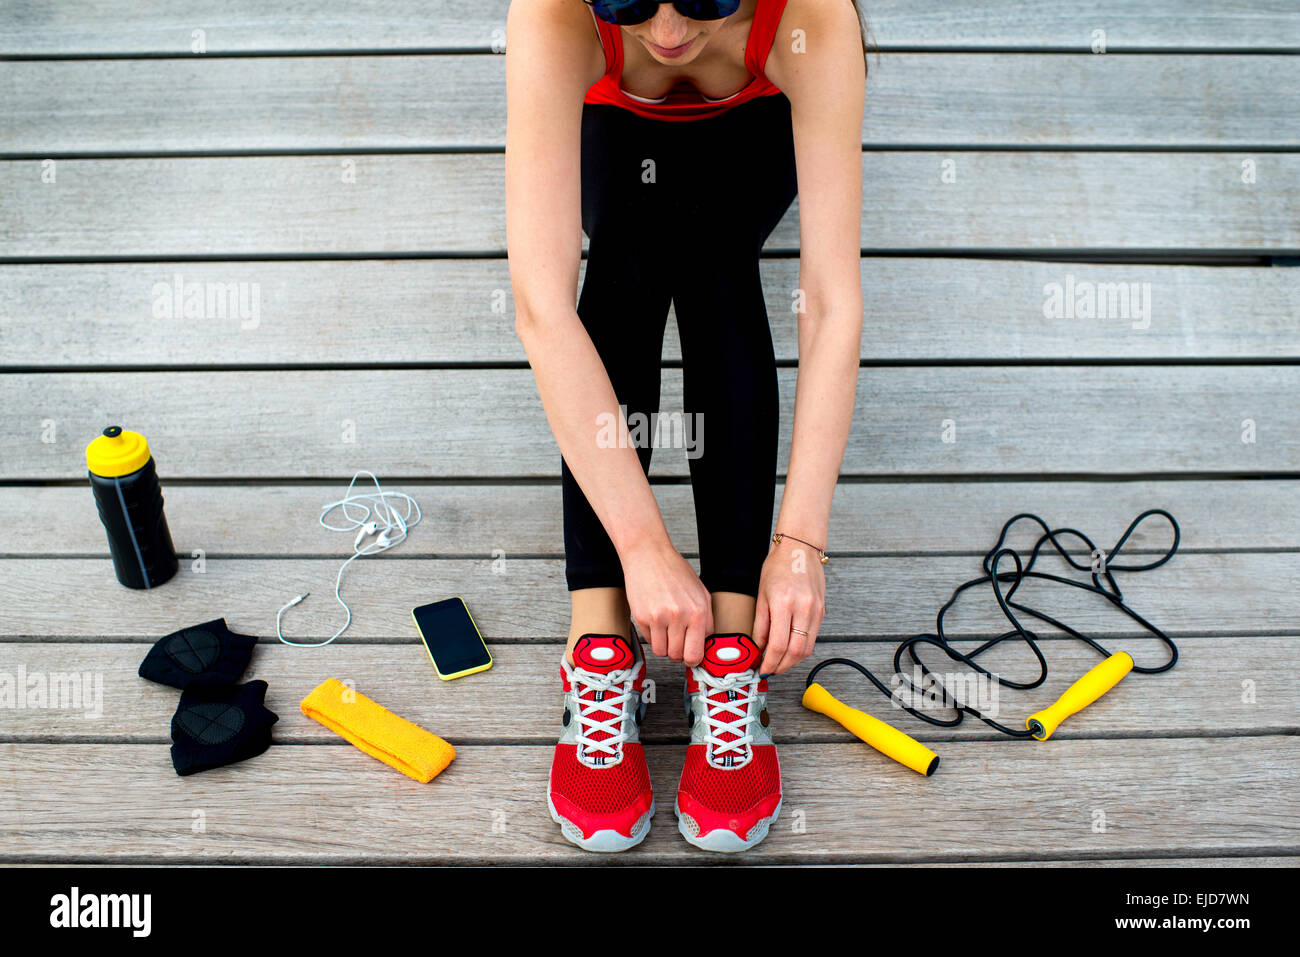 Deporte mujer en la tumbona Imagen De Stock